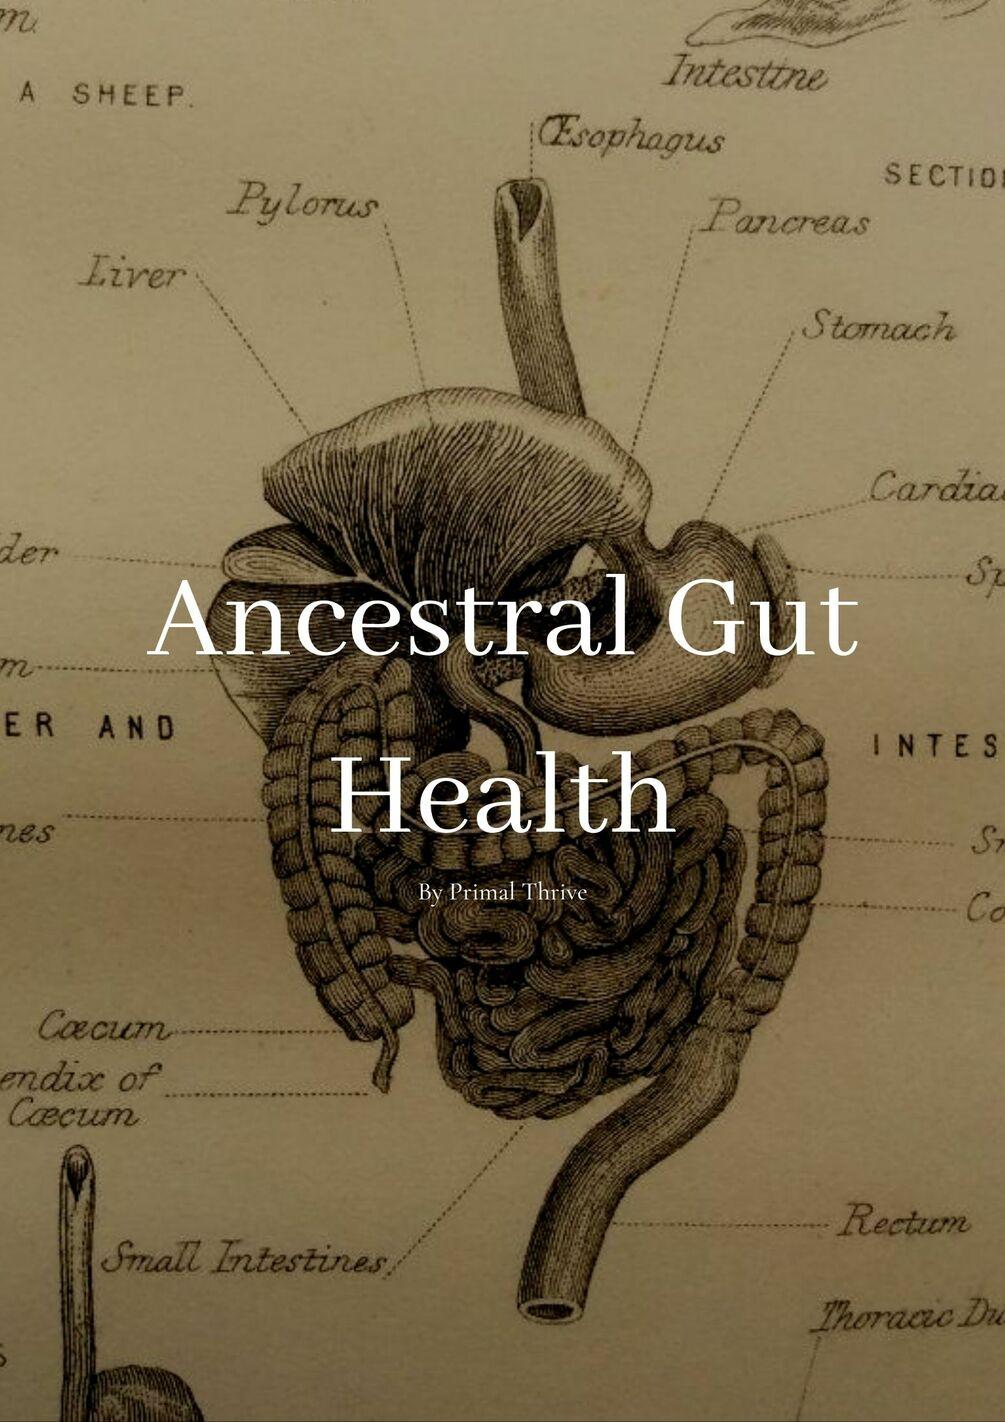 PrimalThrive – Ancestral Gut Health